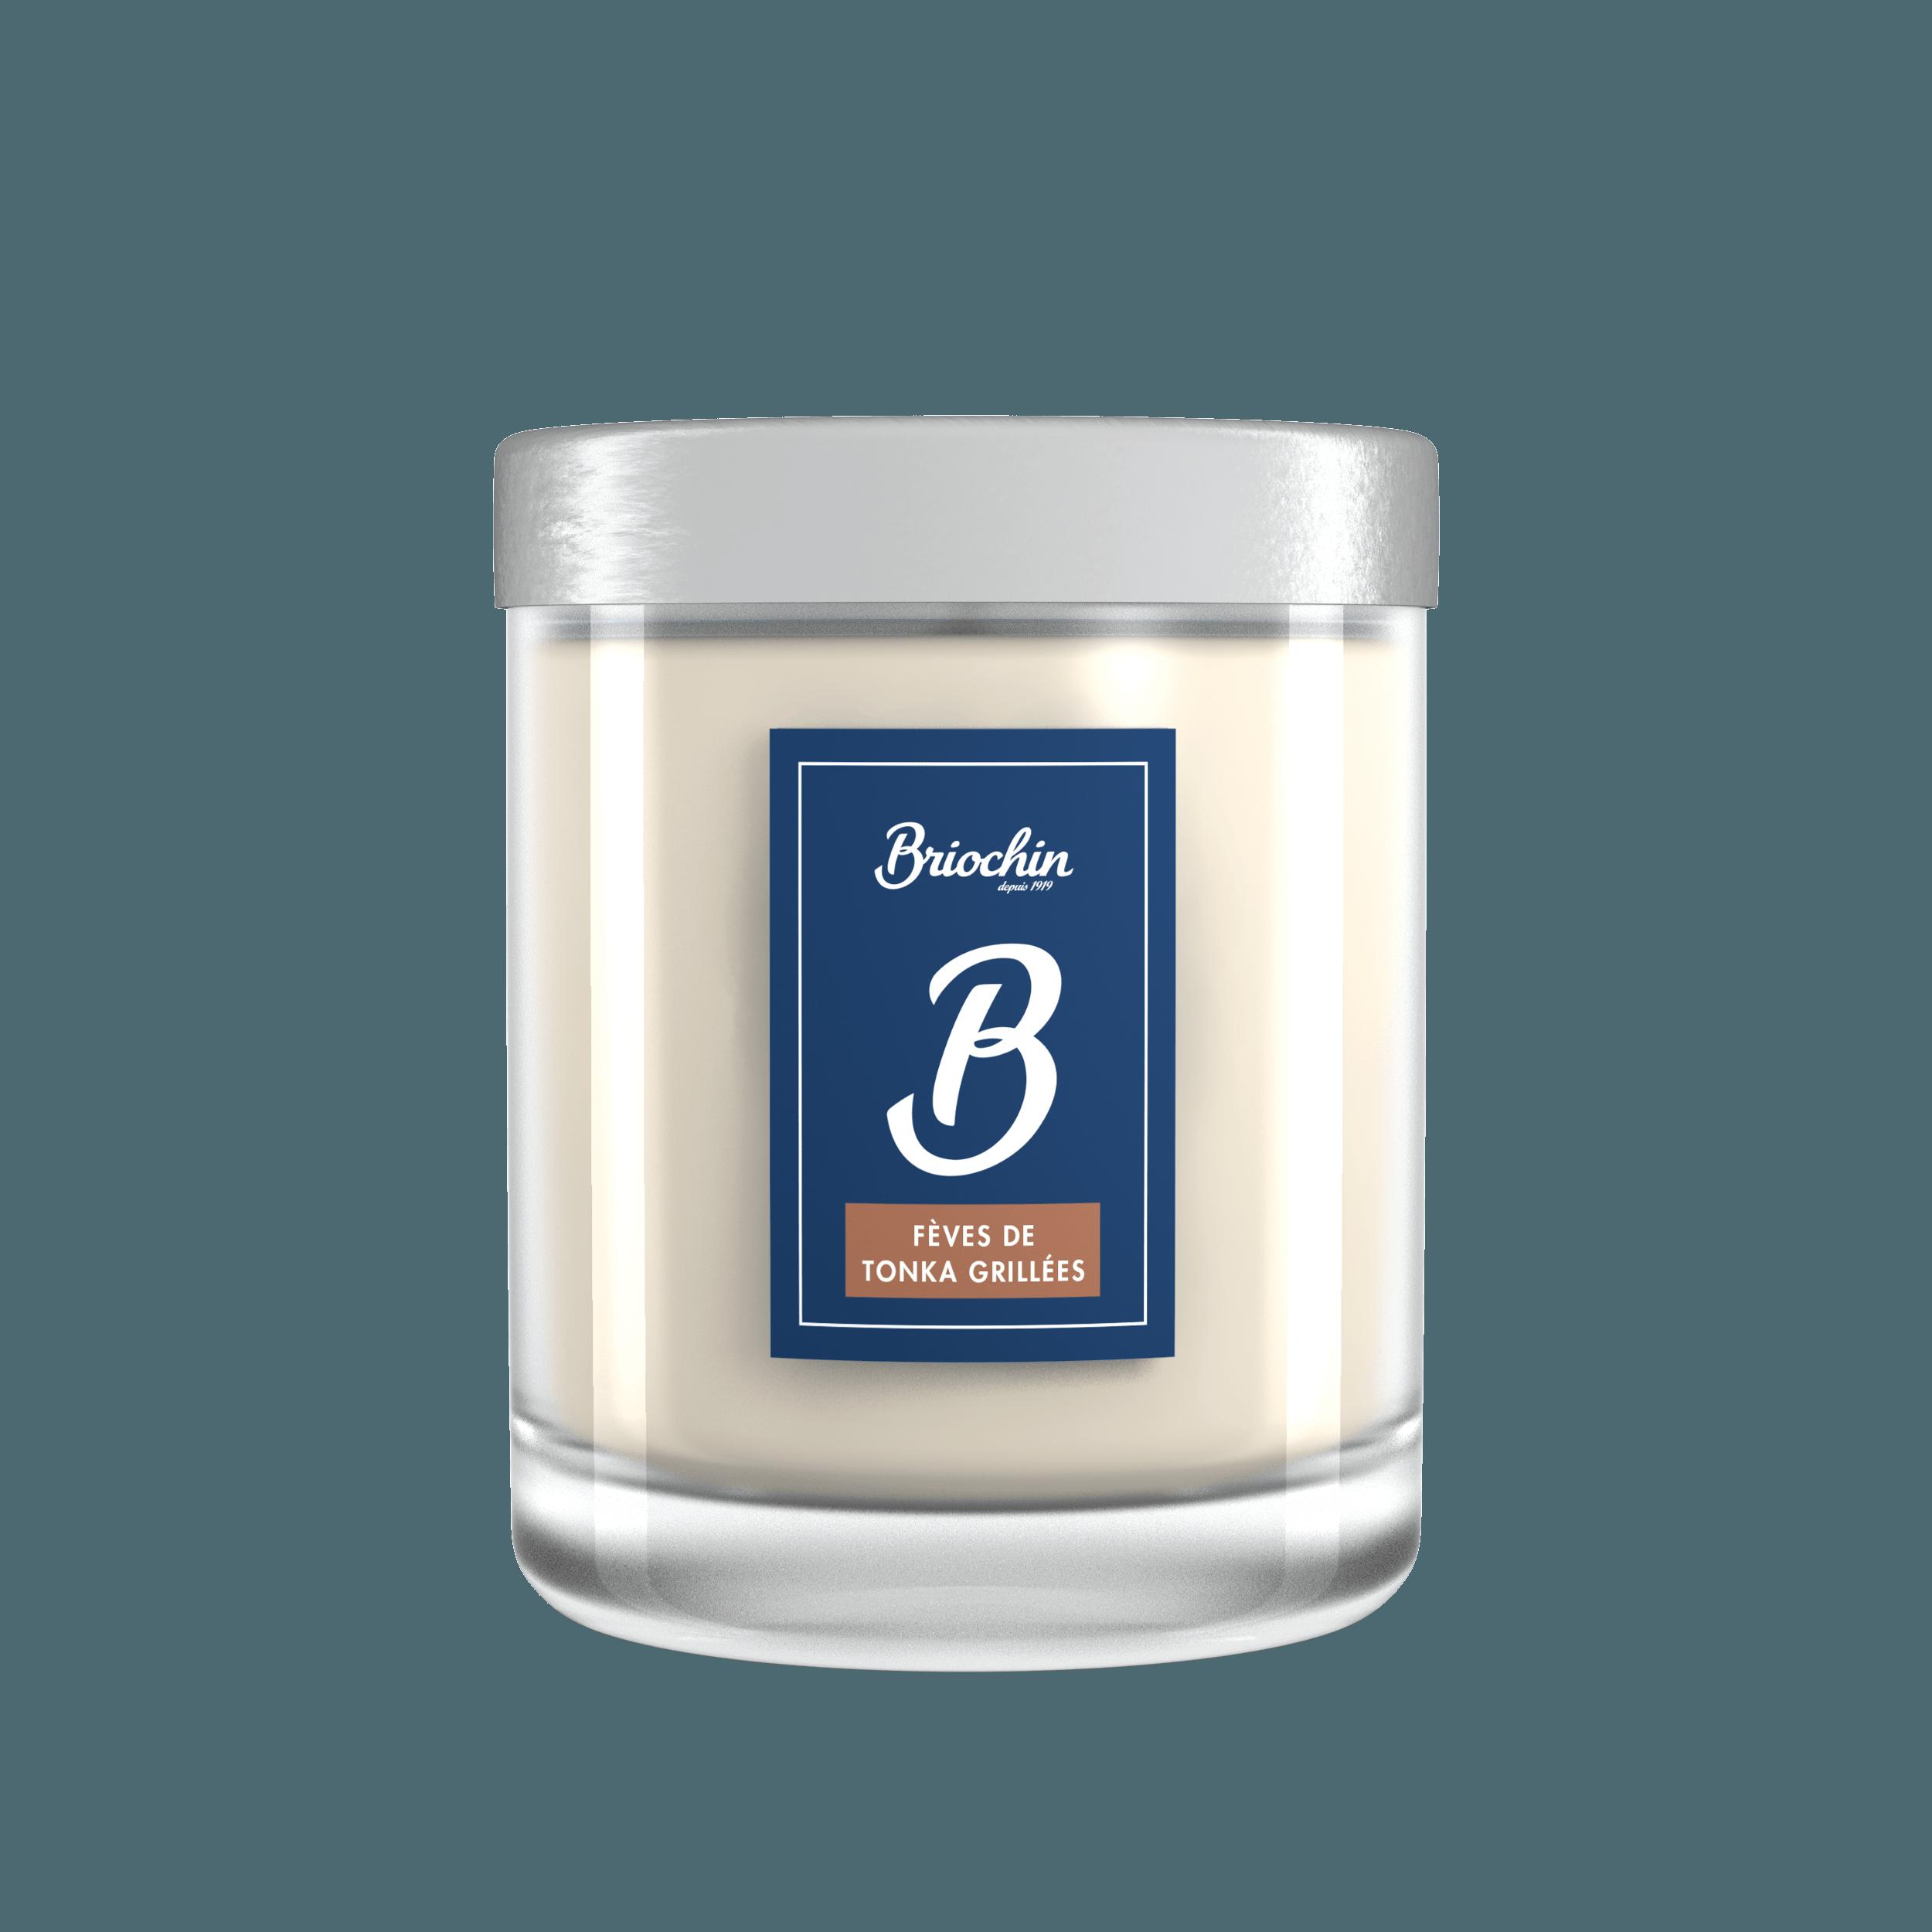 Bicarbonate De Soude Nettoyage Salle De Bain Beautiful Imrage With Bicarbonate De Soude